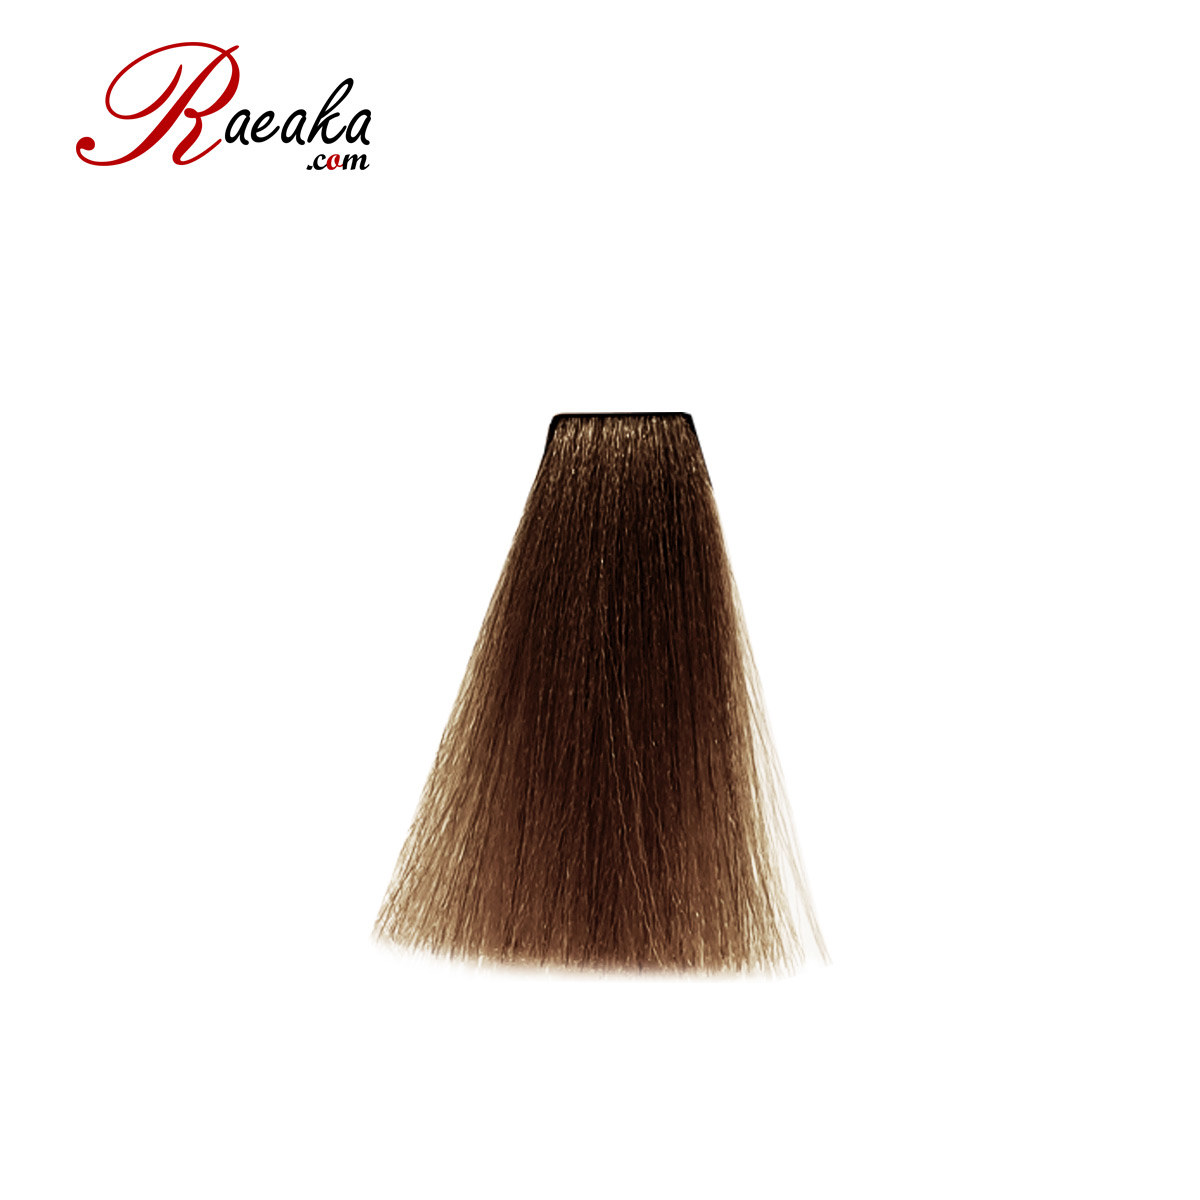 رنگ مو دوشس سری کاکائویی شماره 82-6 حجم 125 میلی لیتر